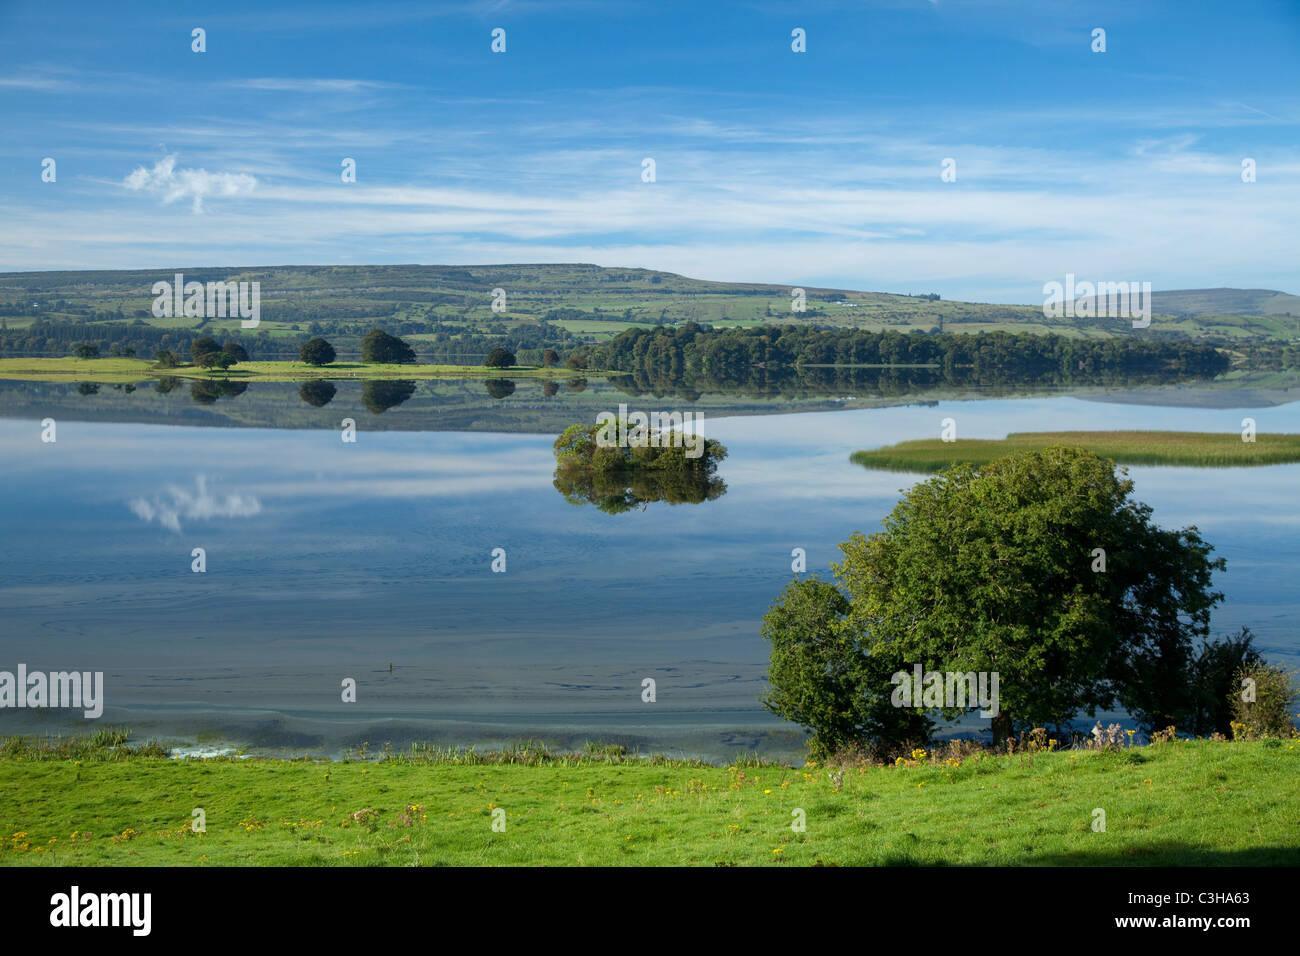 Vue sur Lough Arrow, Comté de Sligo, Irlande. Photo Stock